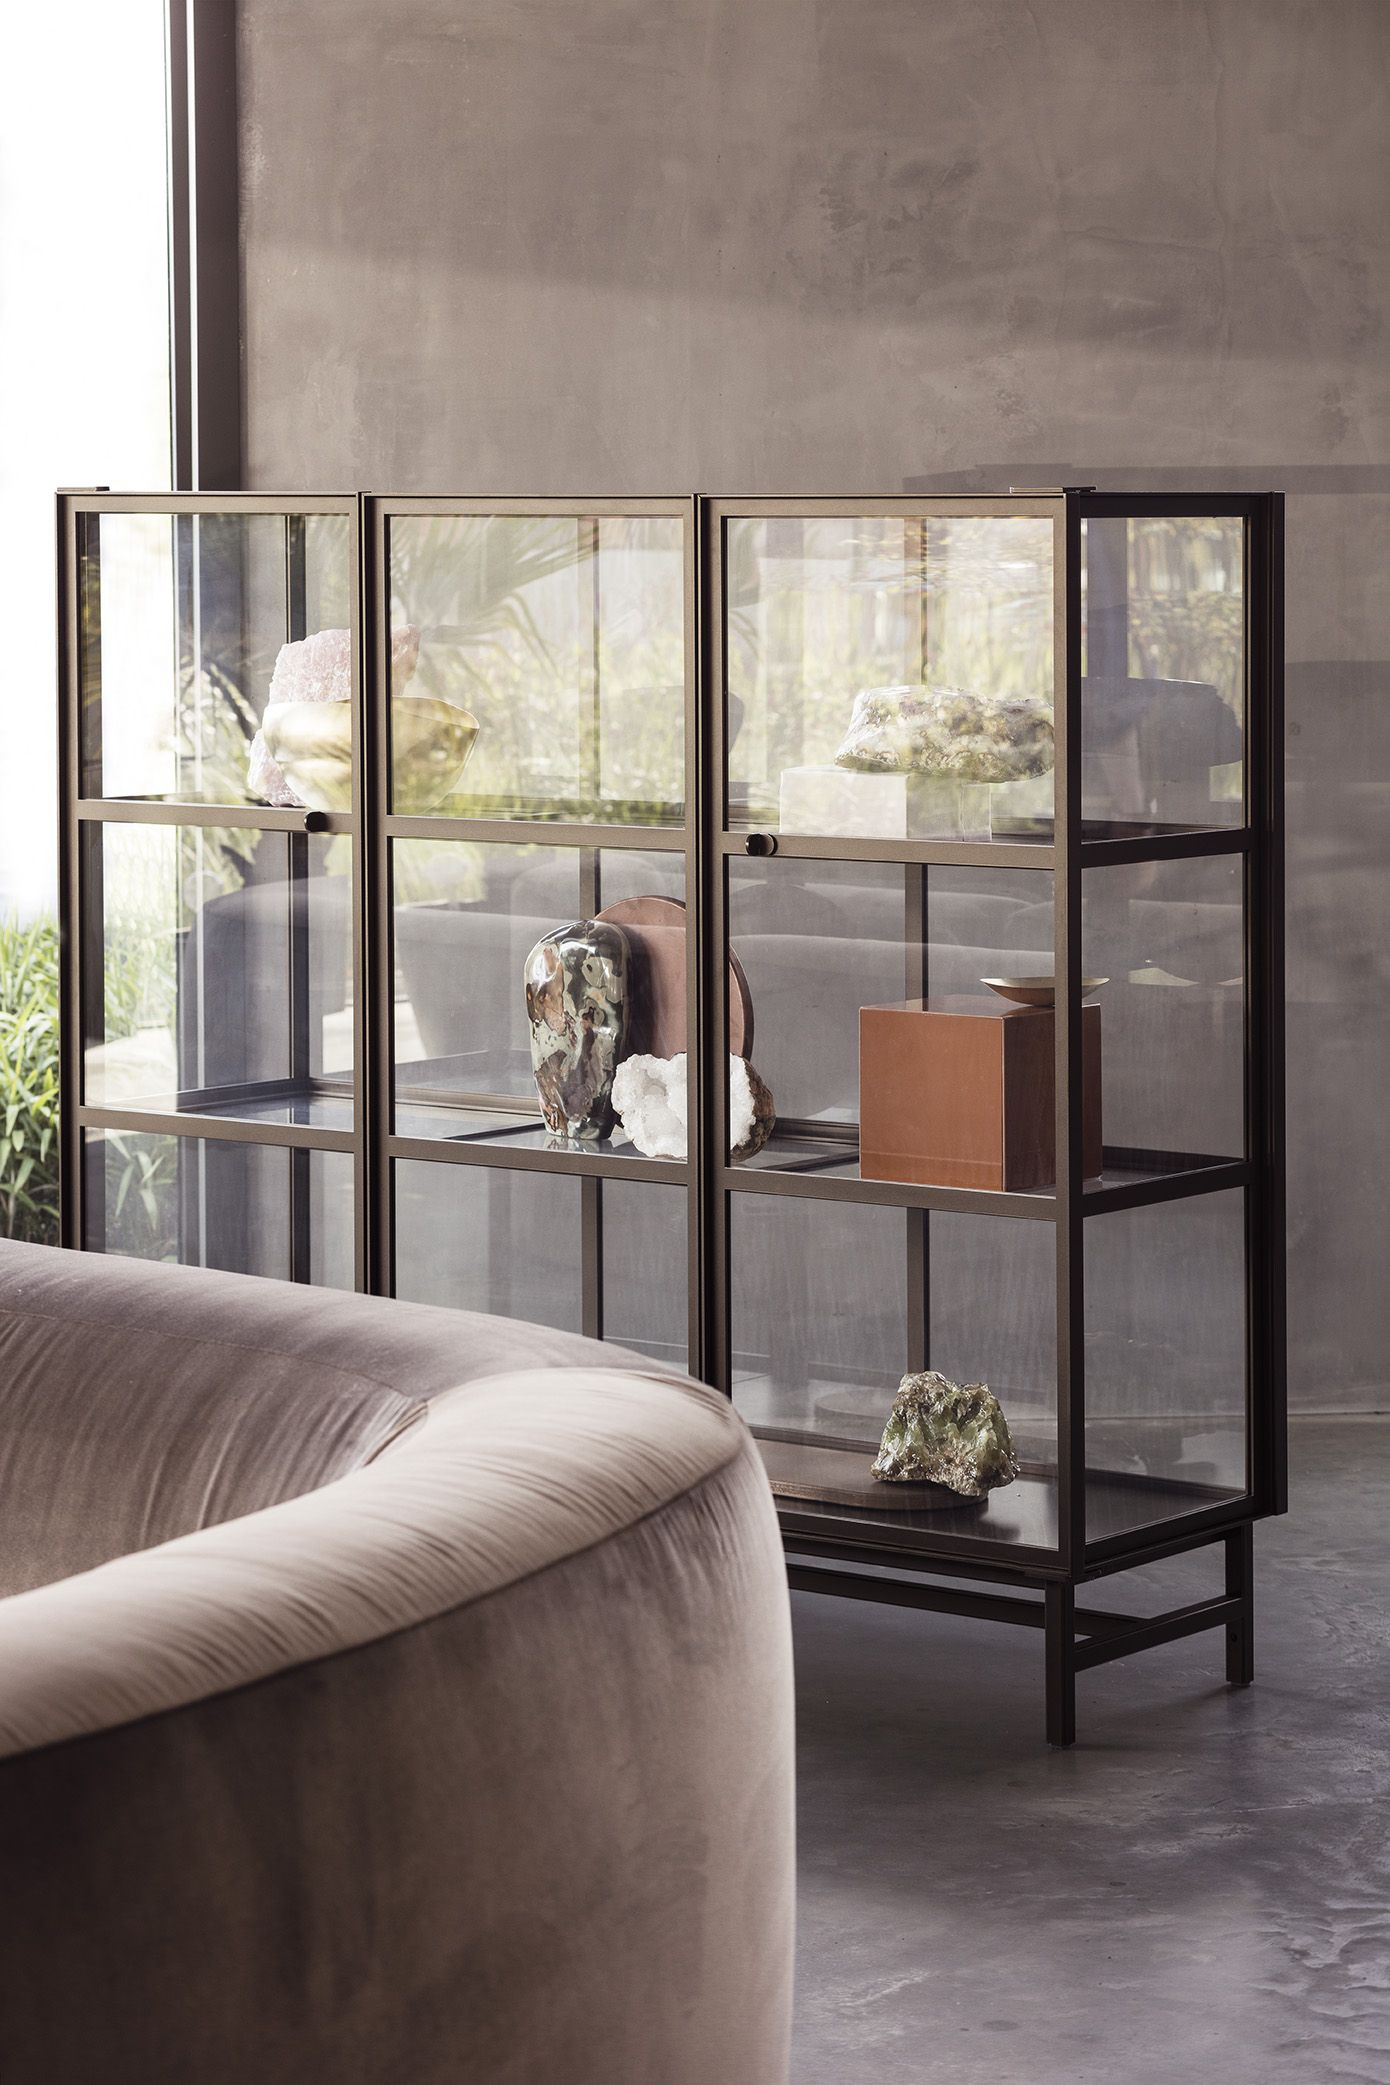 Steel Finn Cabinet Round Bo Sofa Concrete Floor More